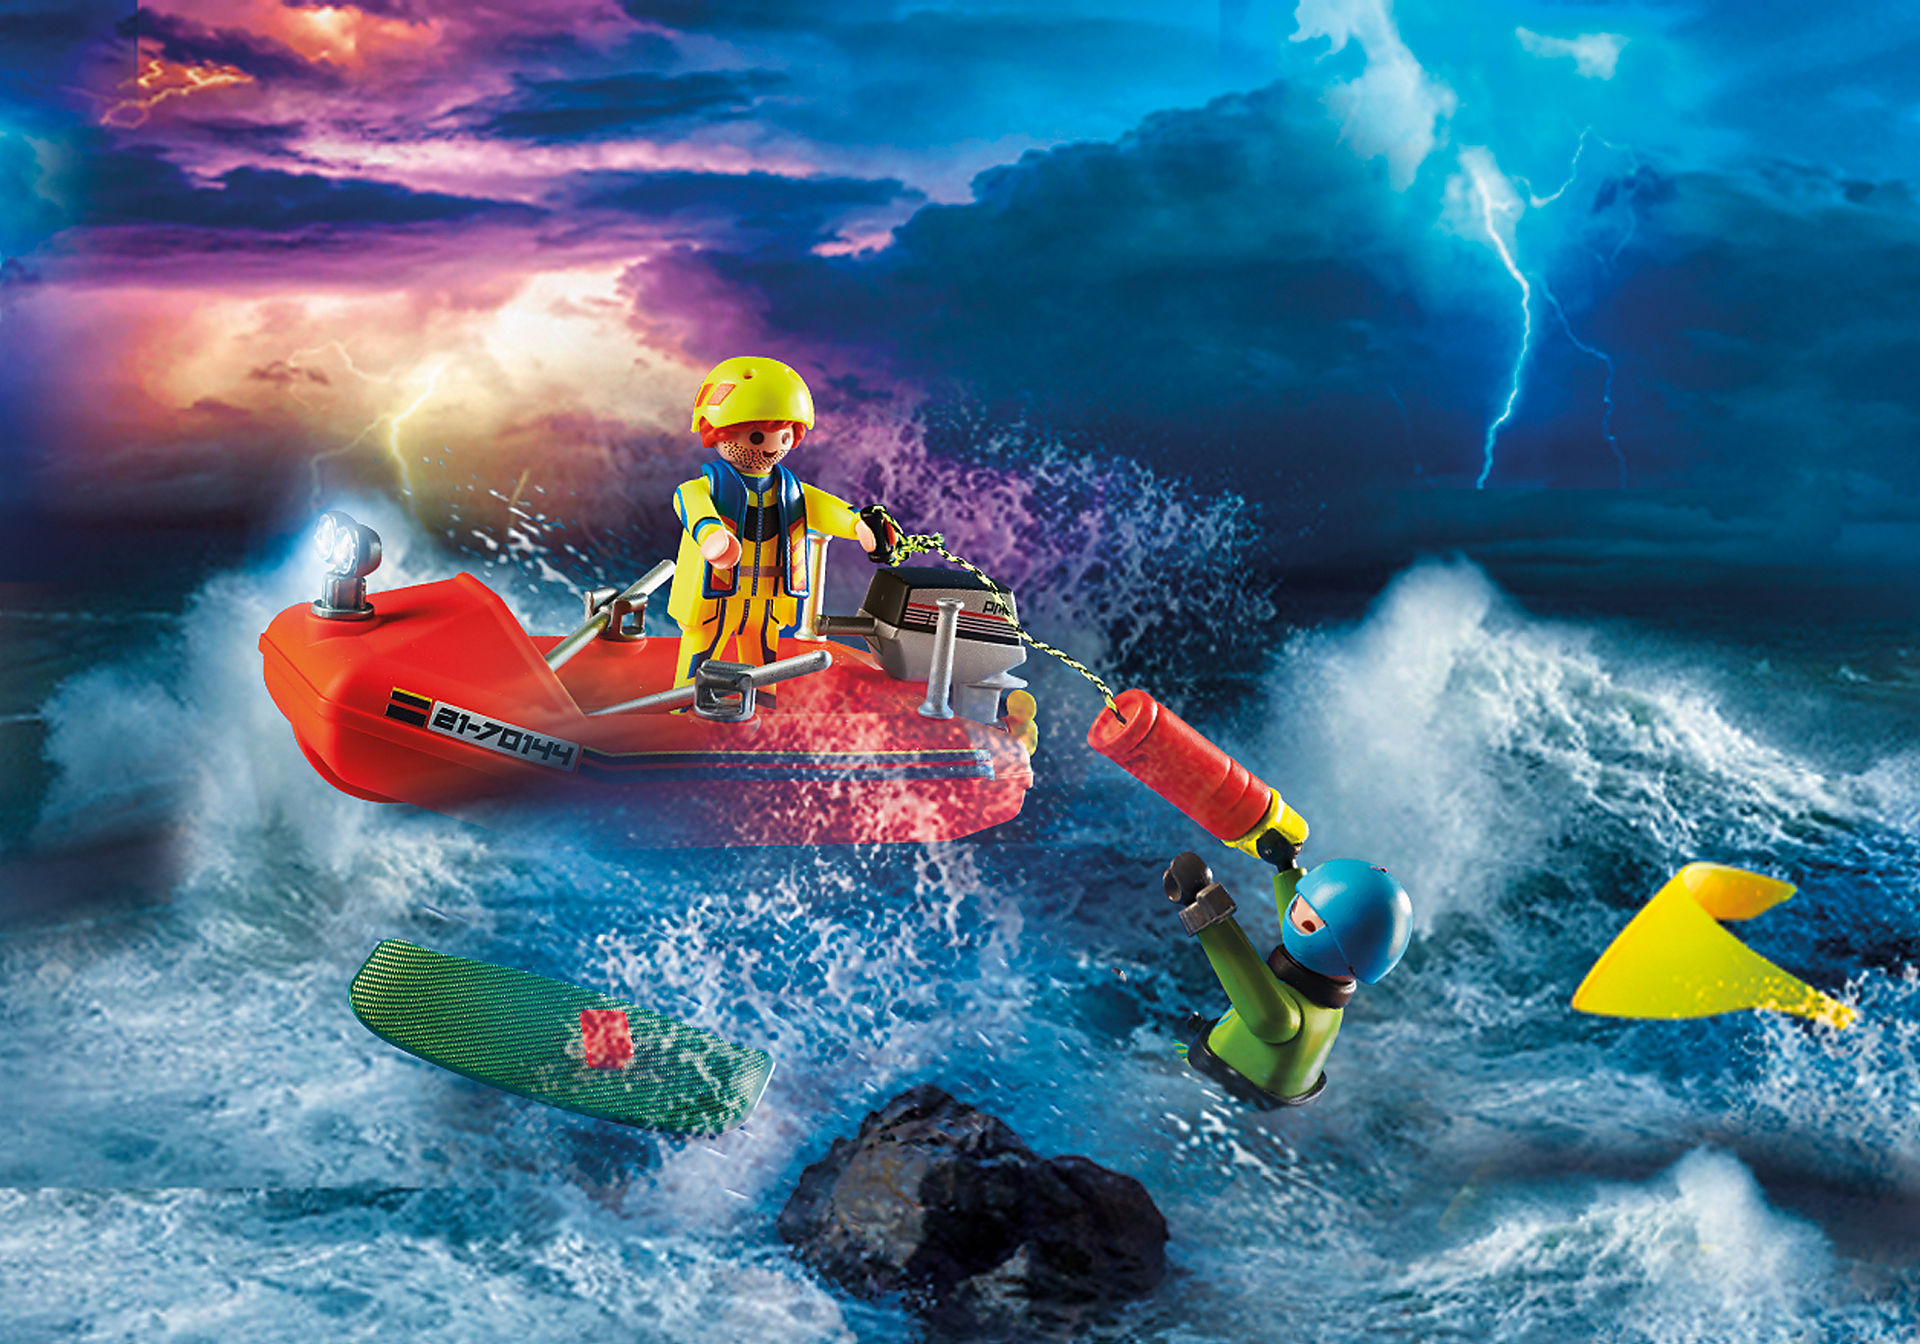 70144 Kitesurfer Rescue with Speedboat zoom image5